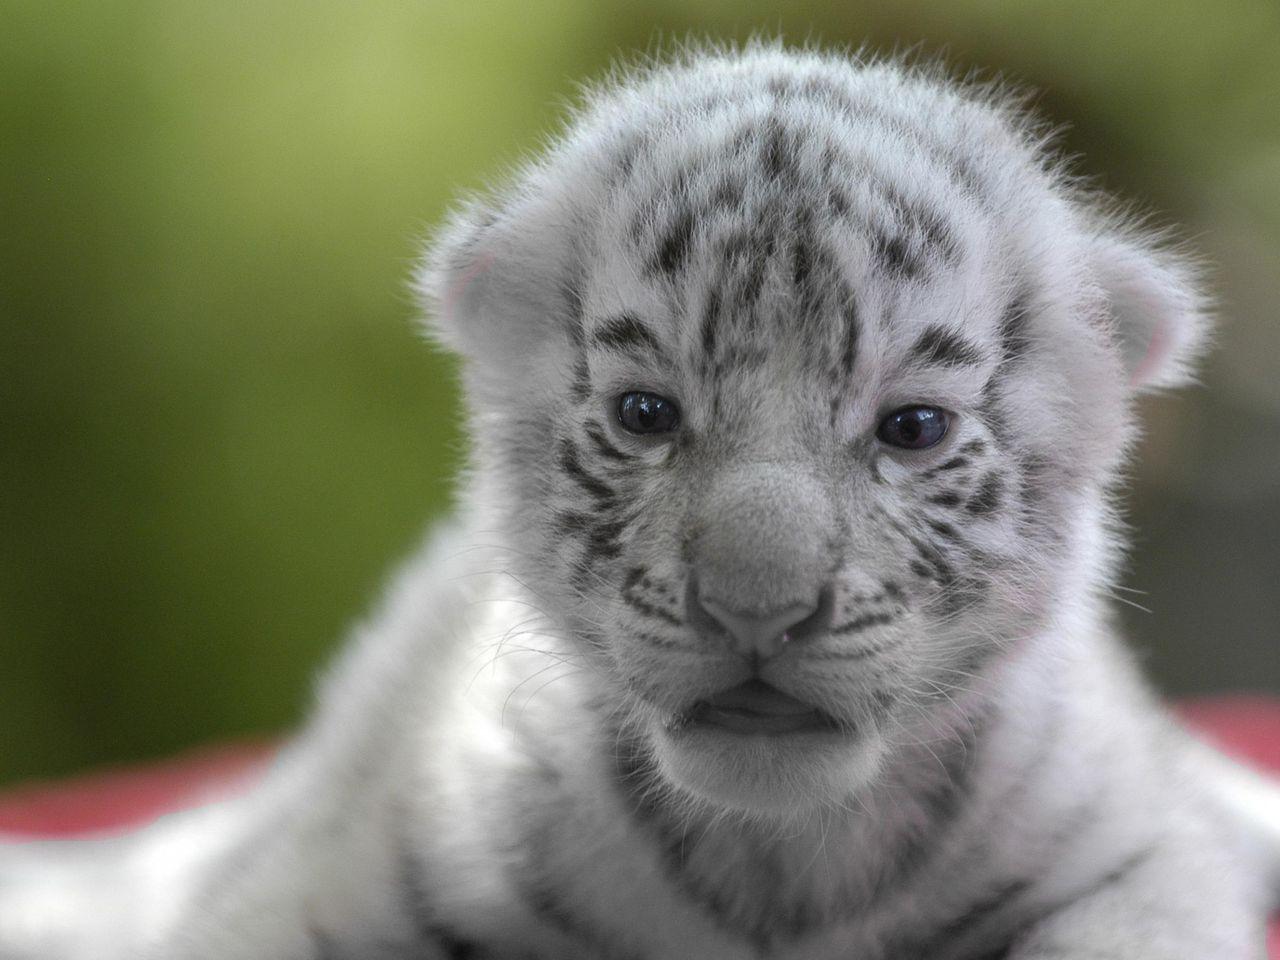 Newborn White Tiger Cubs | www.pixshark.com - Images ...